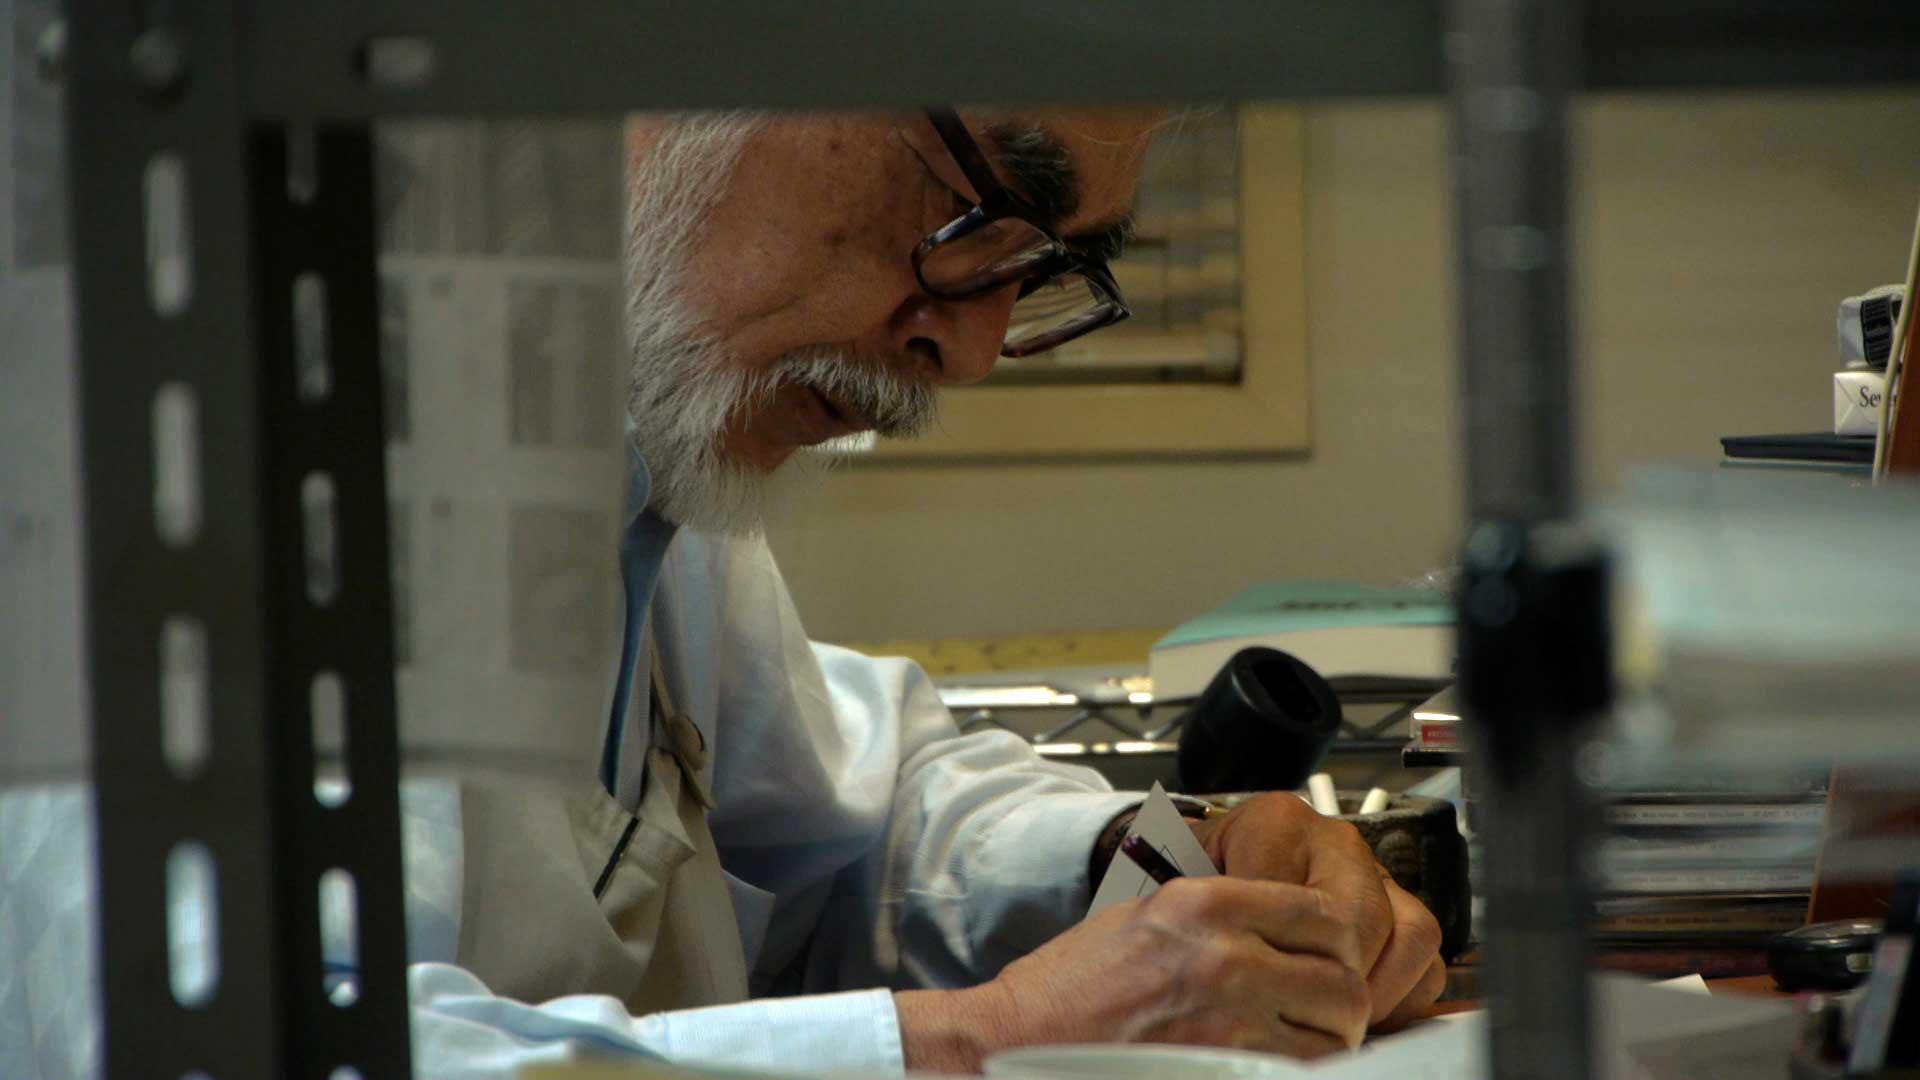 Hayao-Miyazaki-working-on-THE-WIND-RISES-©-2013-dwango